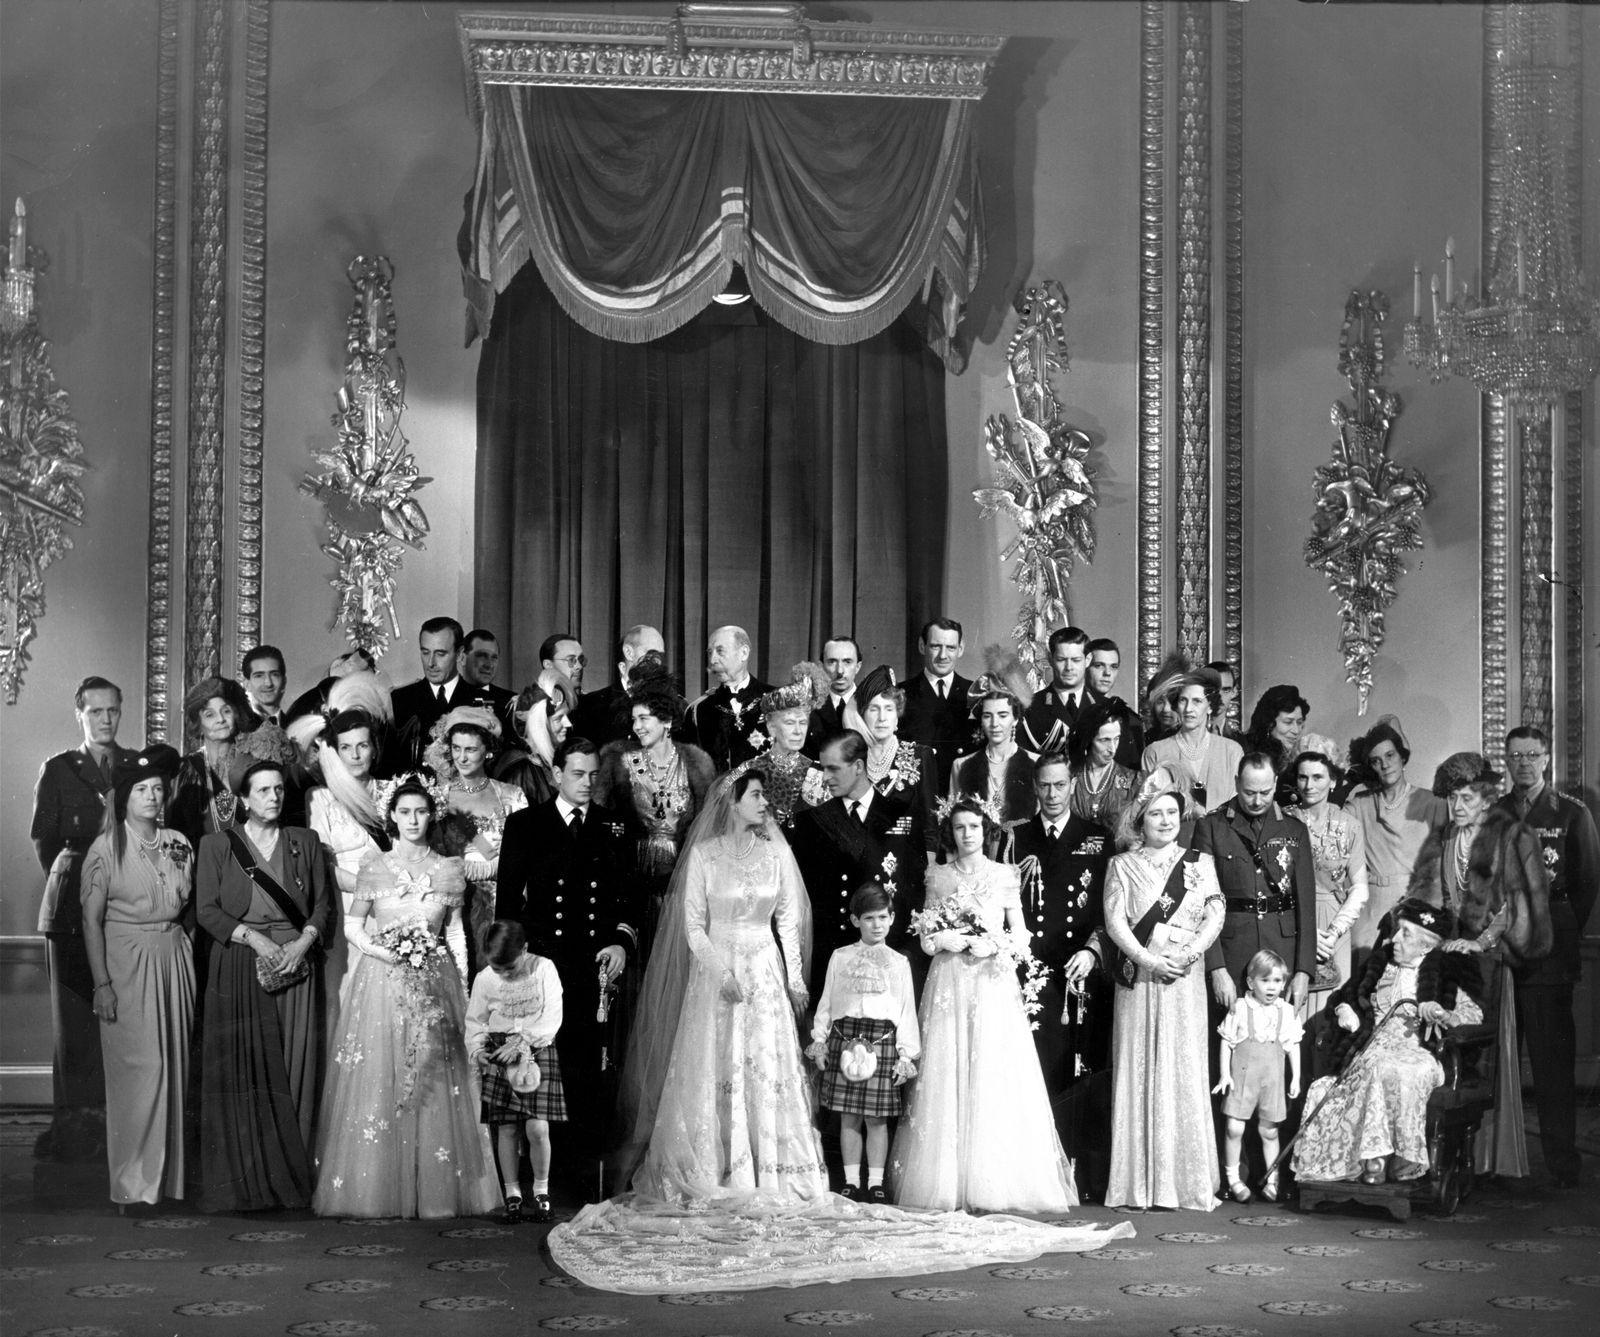 Queen Wedding: What Queen Elizabeth's Wedding Day Was Really Like